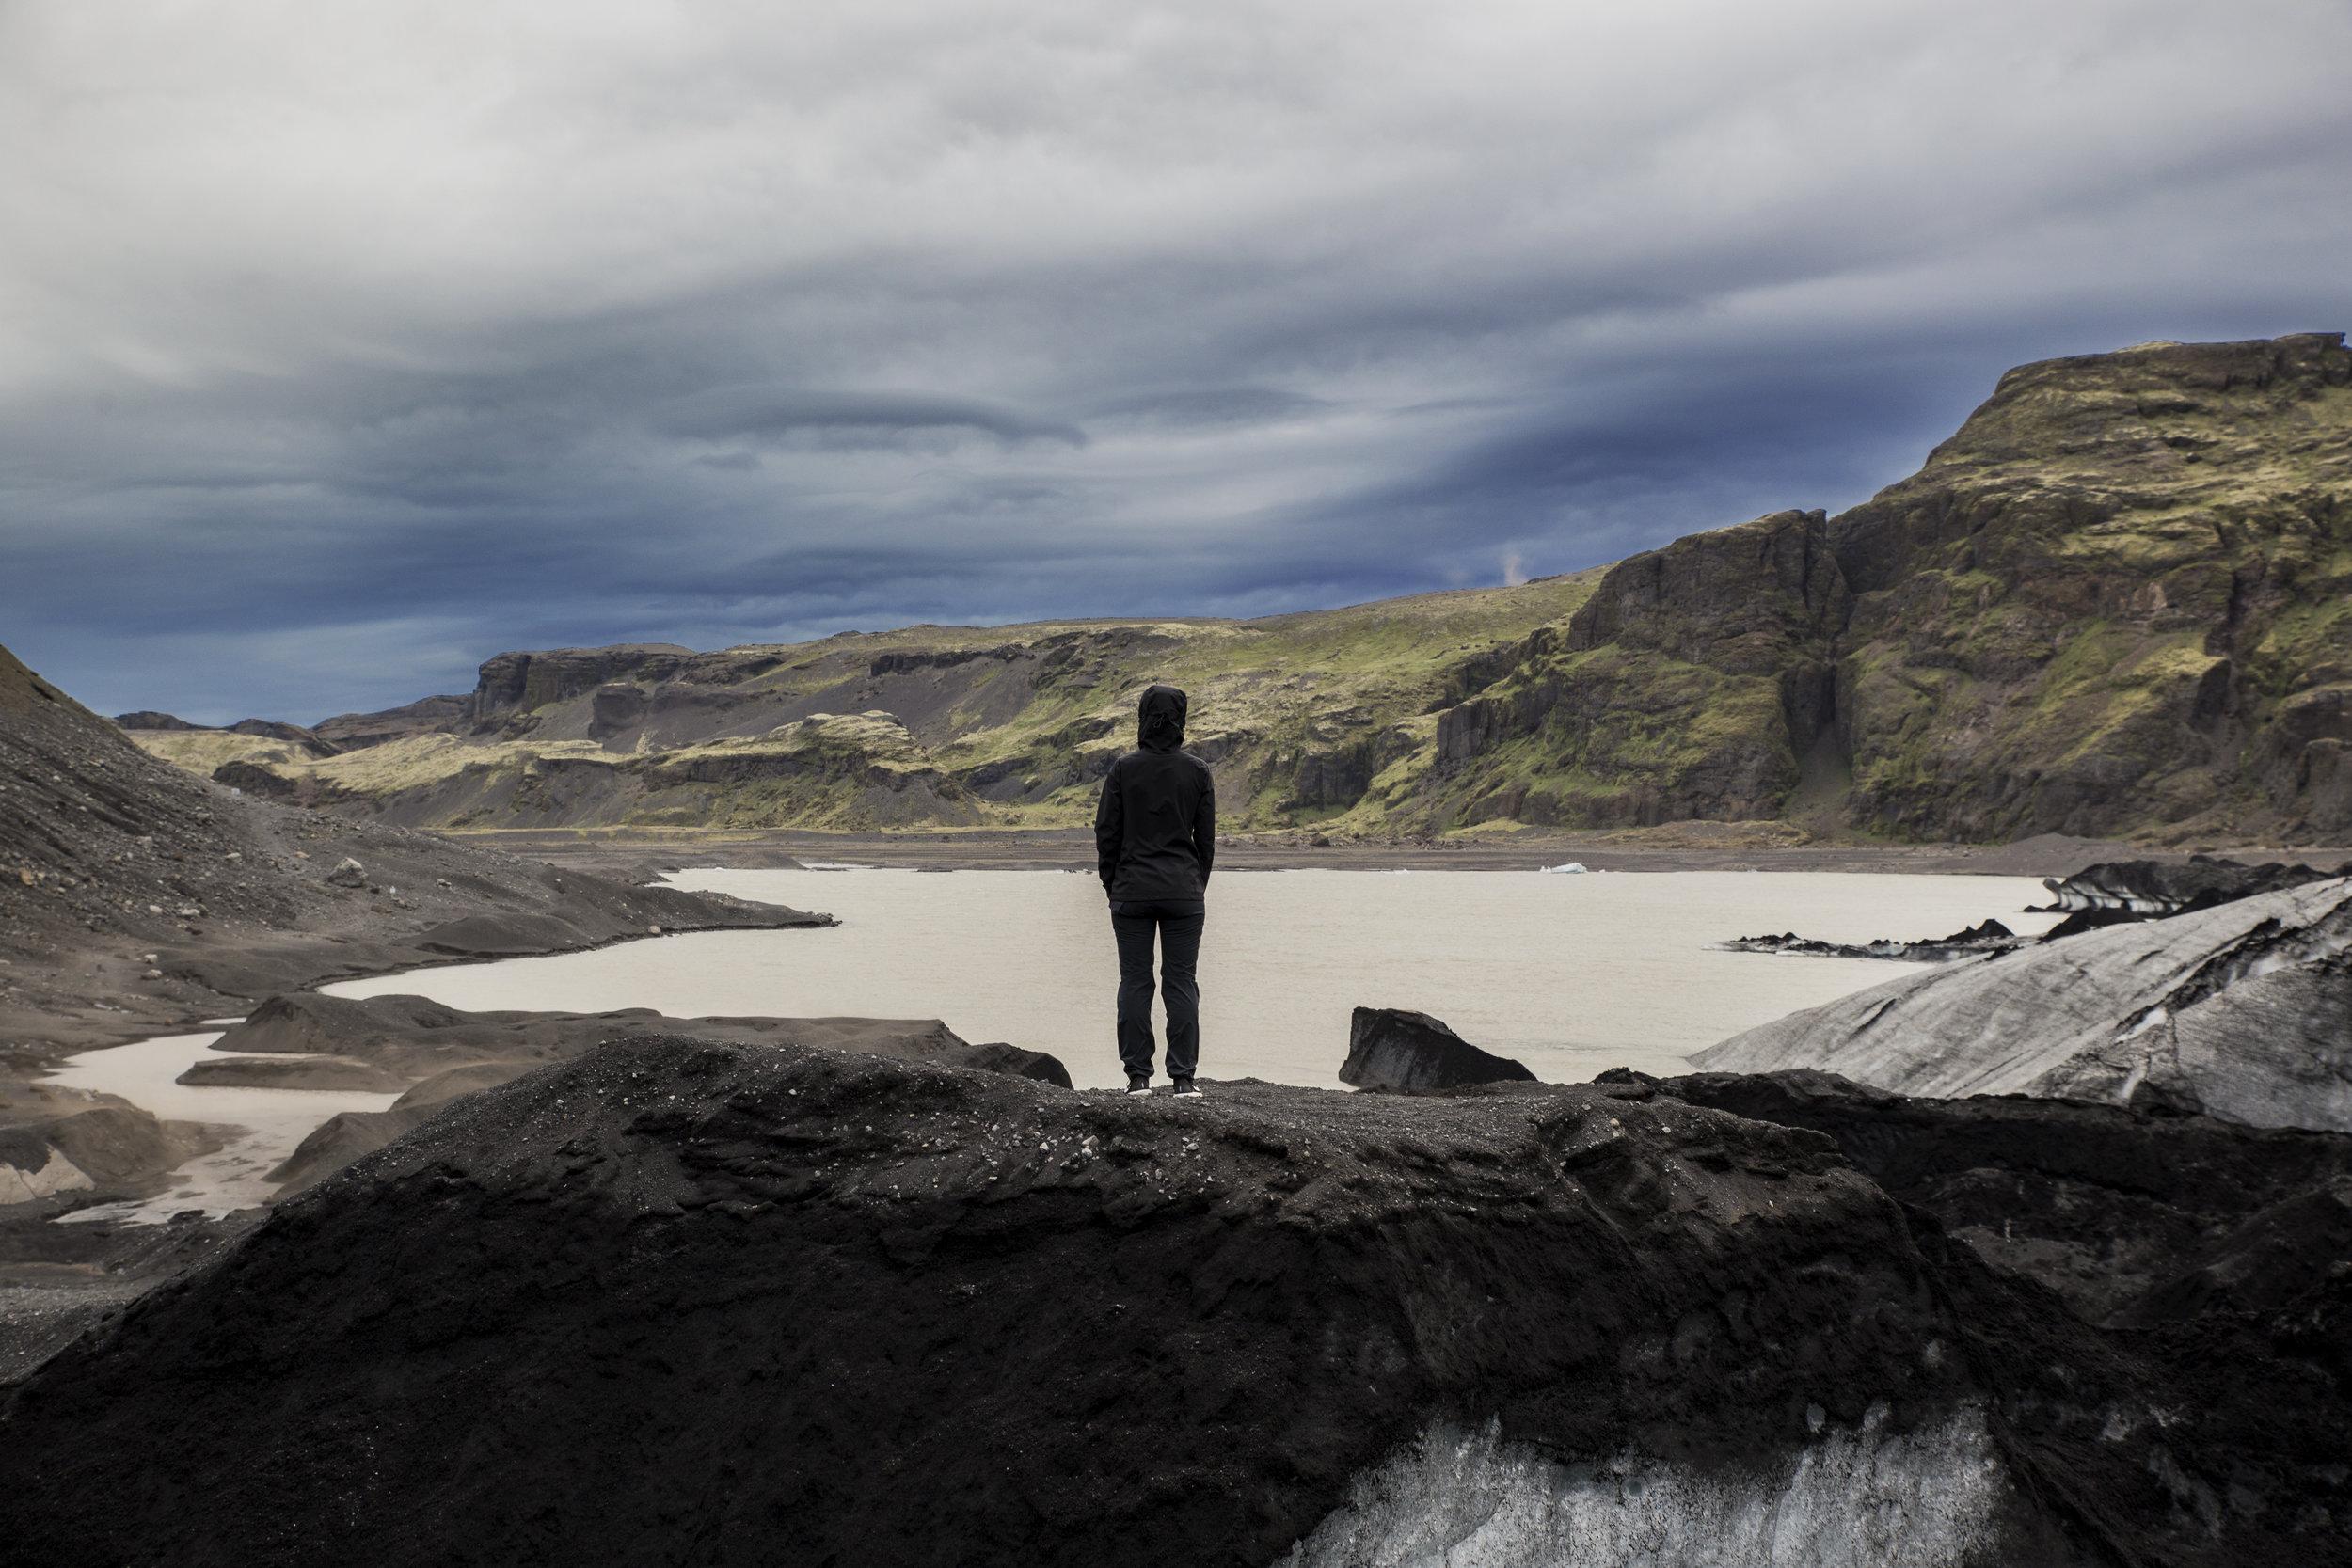 Photo: Niklas Lindgren / Southern region of Iceland